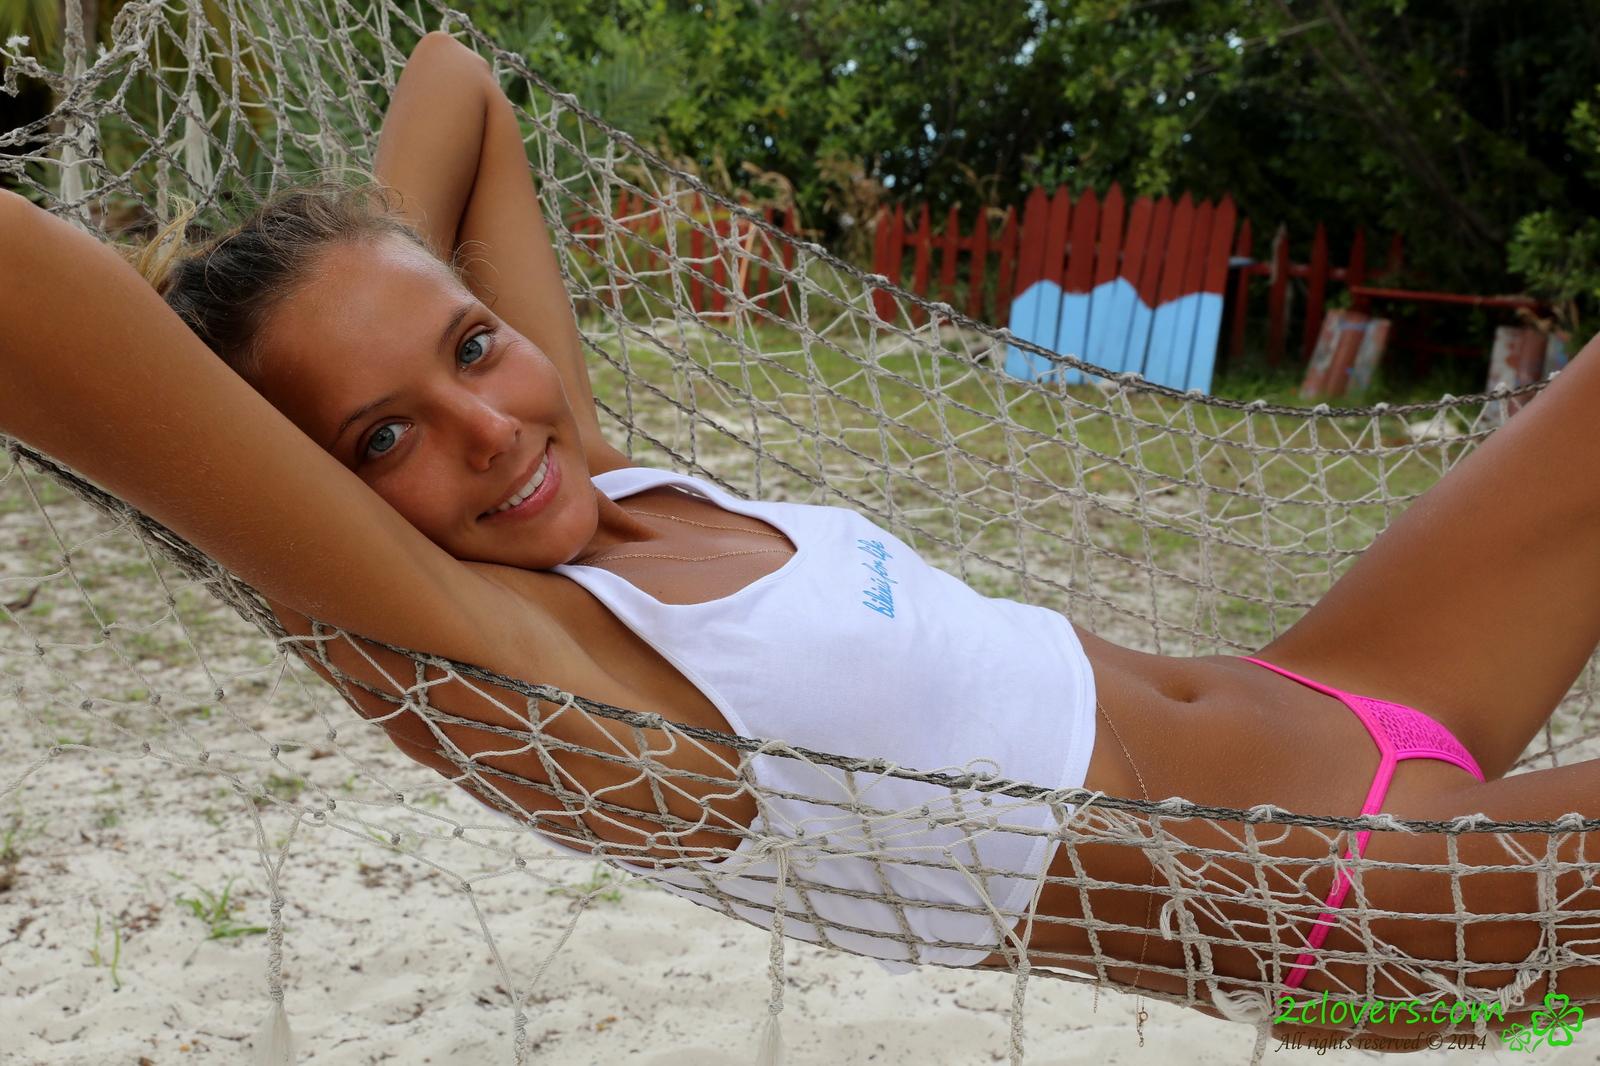 katya-clover-naked-on-sirena-beach-seaside-2clovers-15